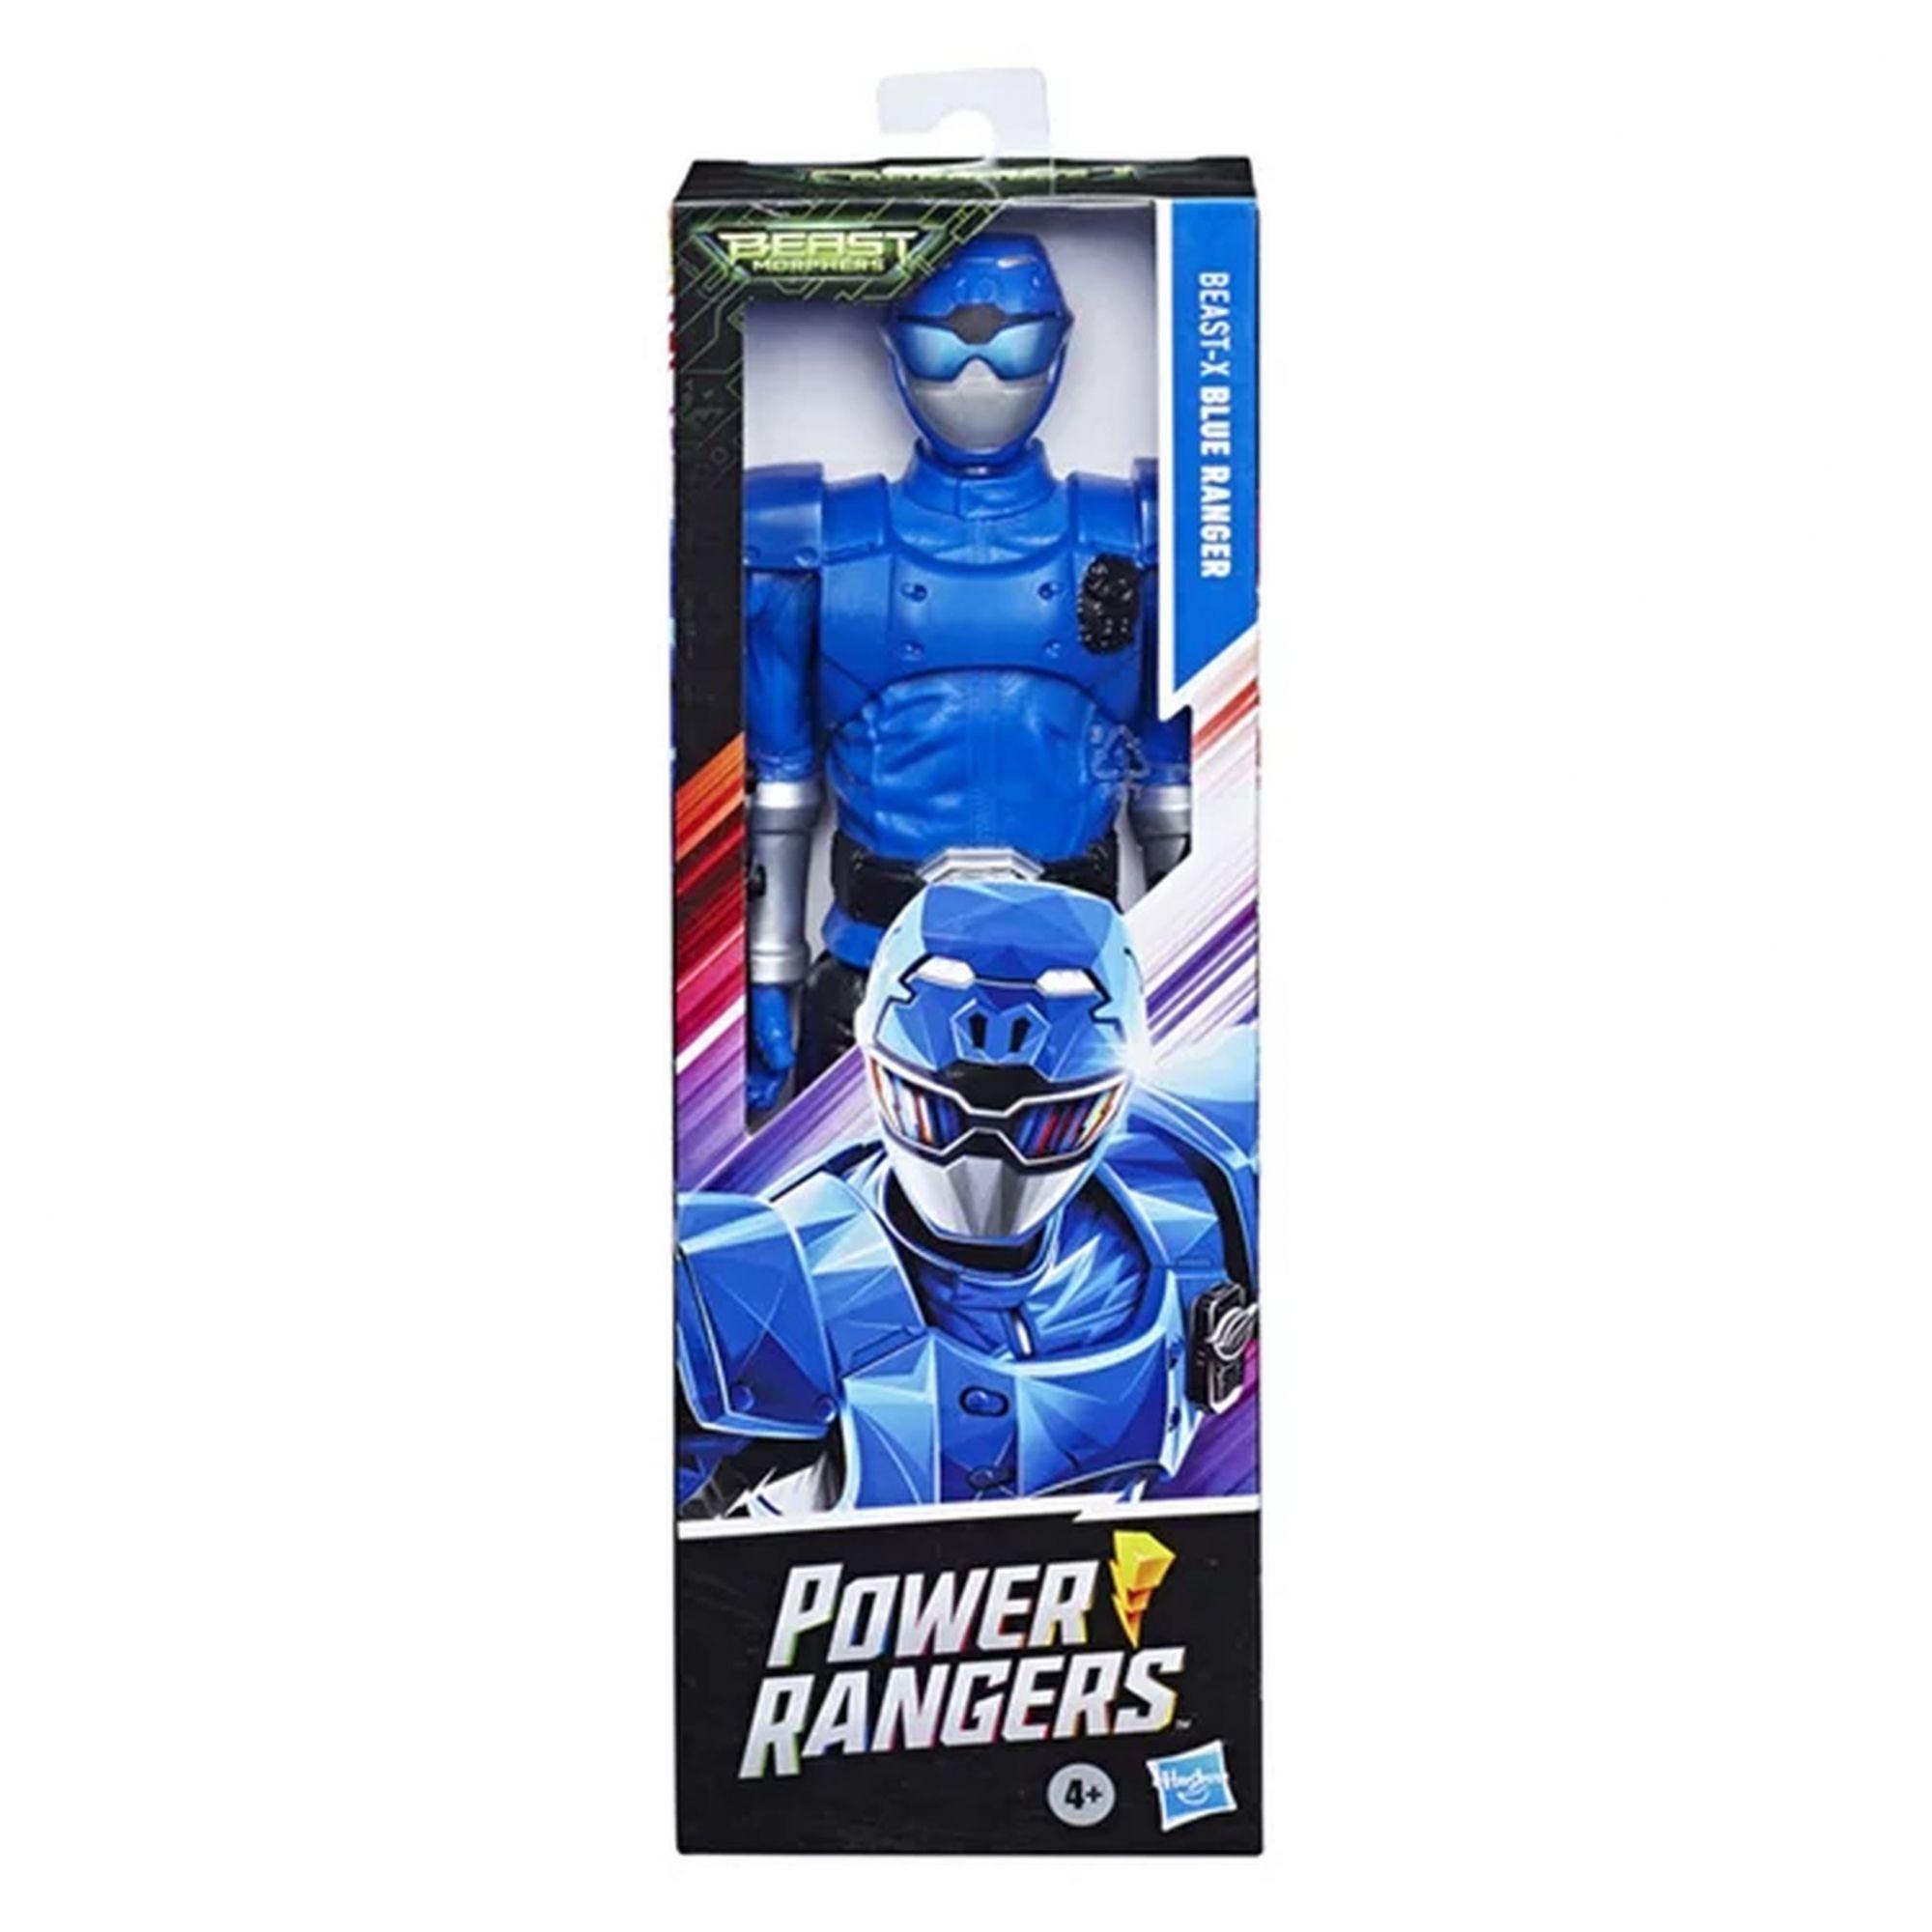 Power Rangers Boneco Ranger Azul Beast-X - Hasbro E7803